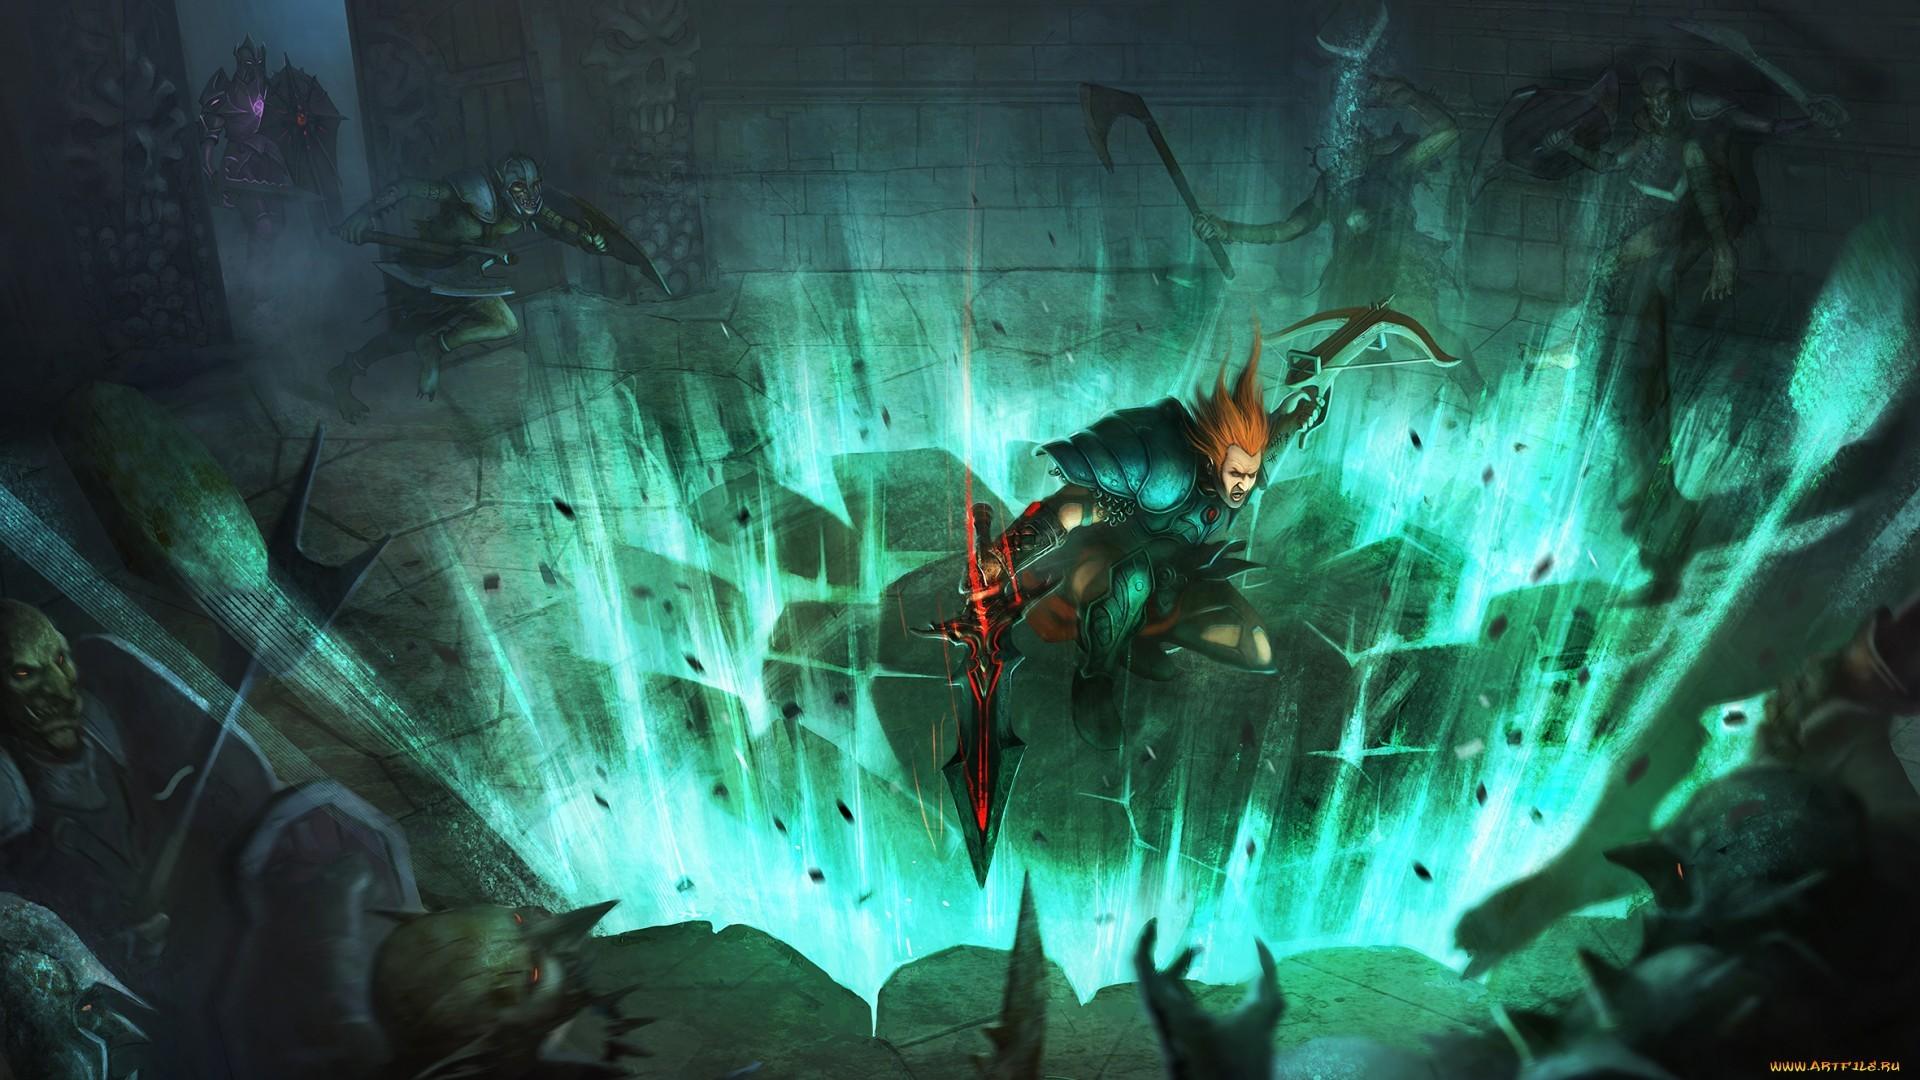 RuneScape Wallpaper Gallery Best Game Wallpapers